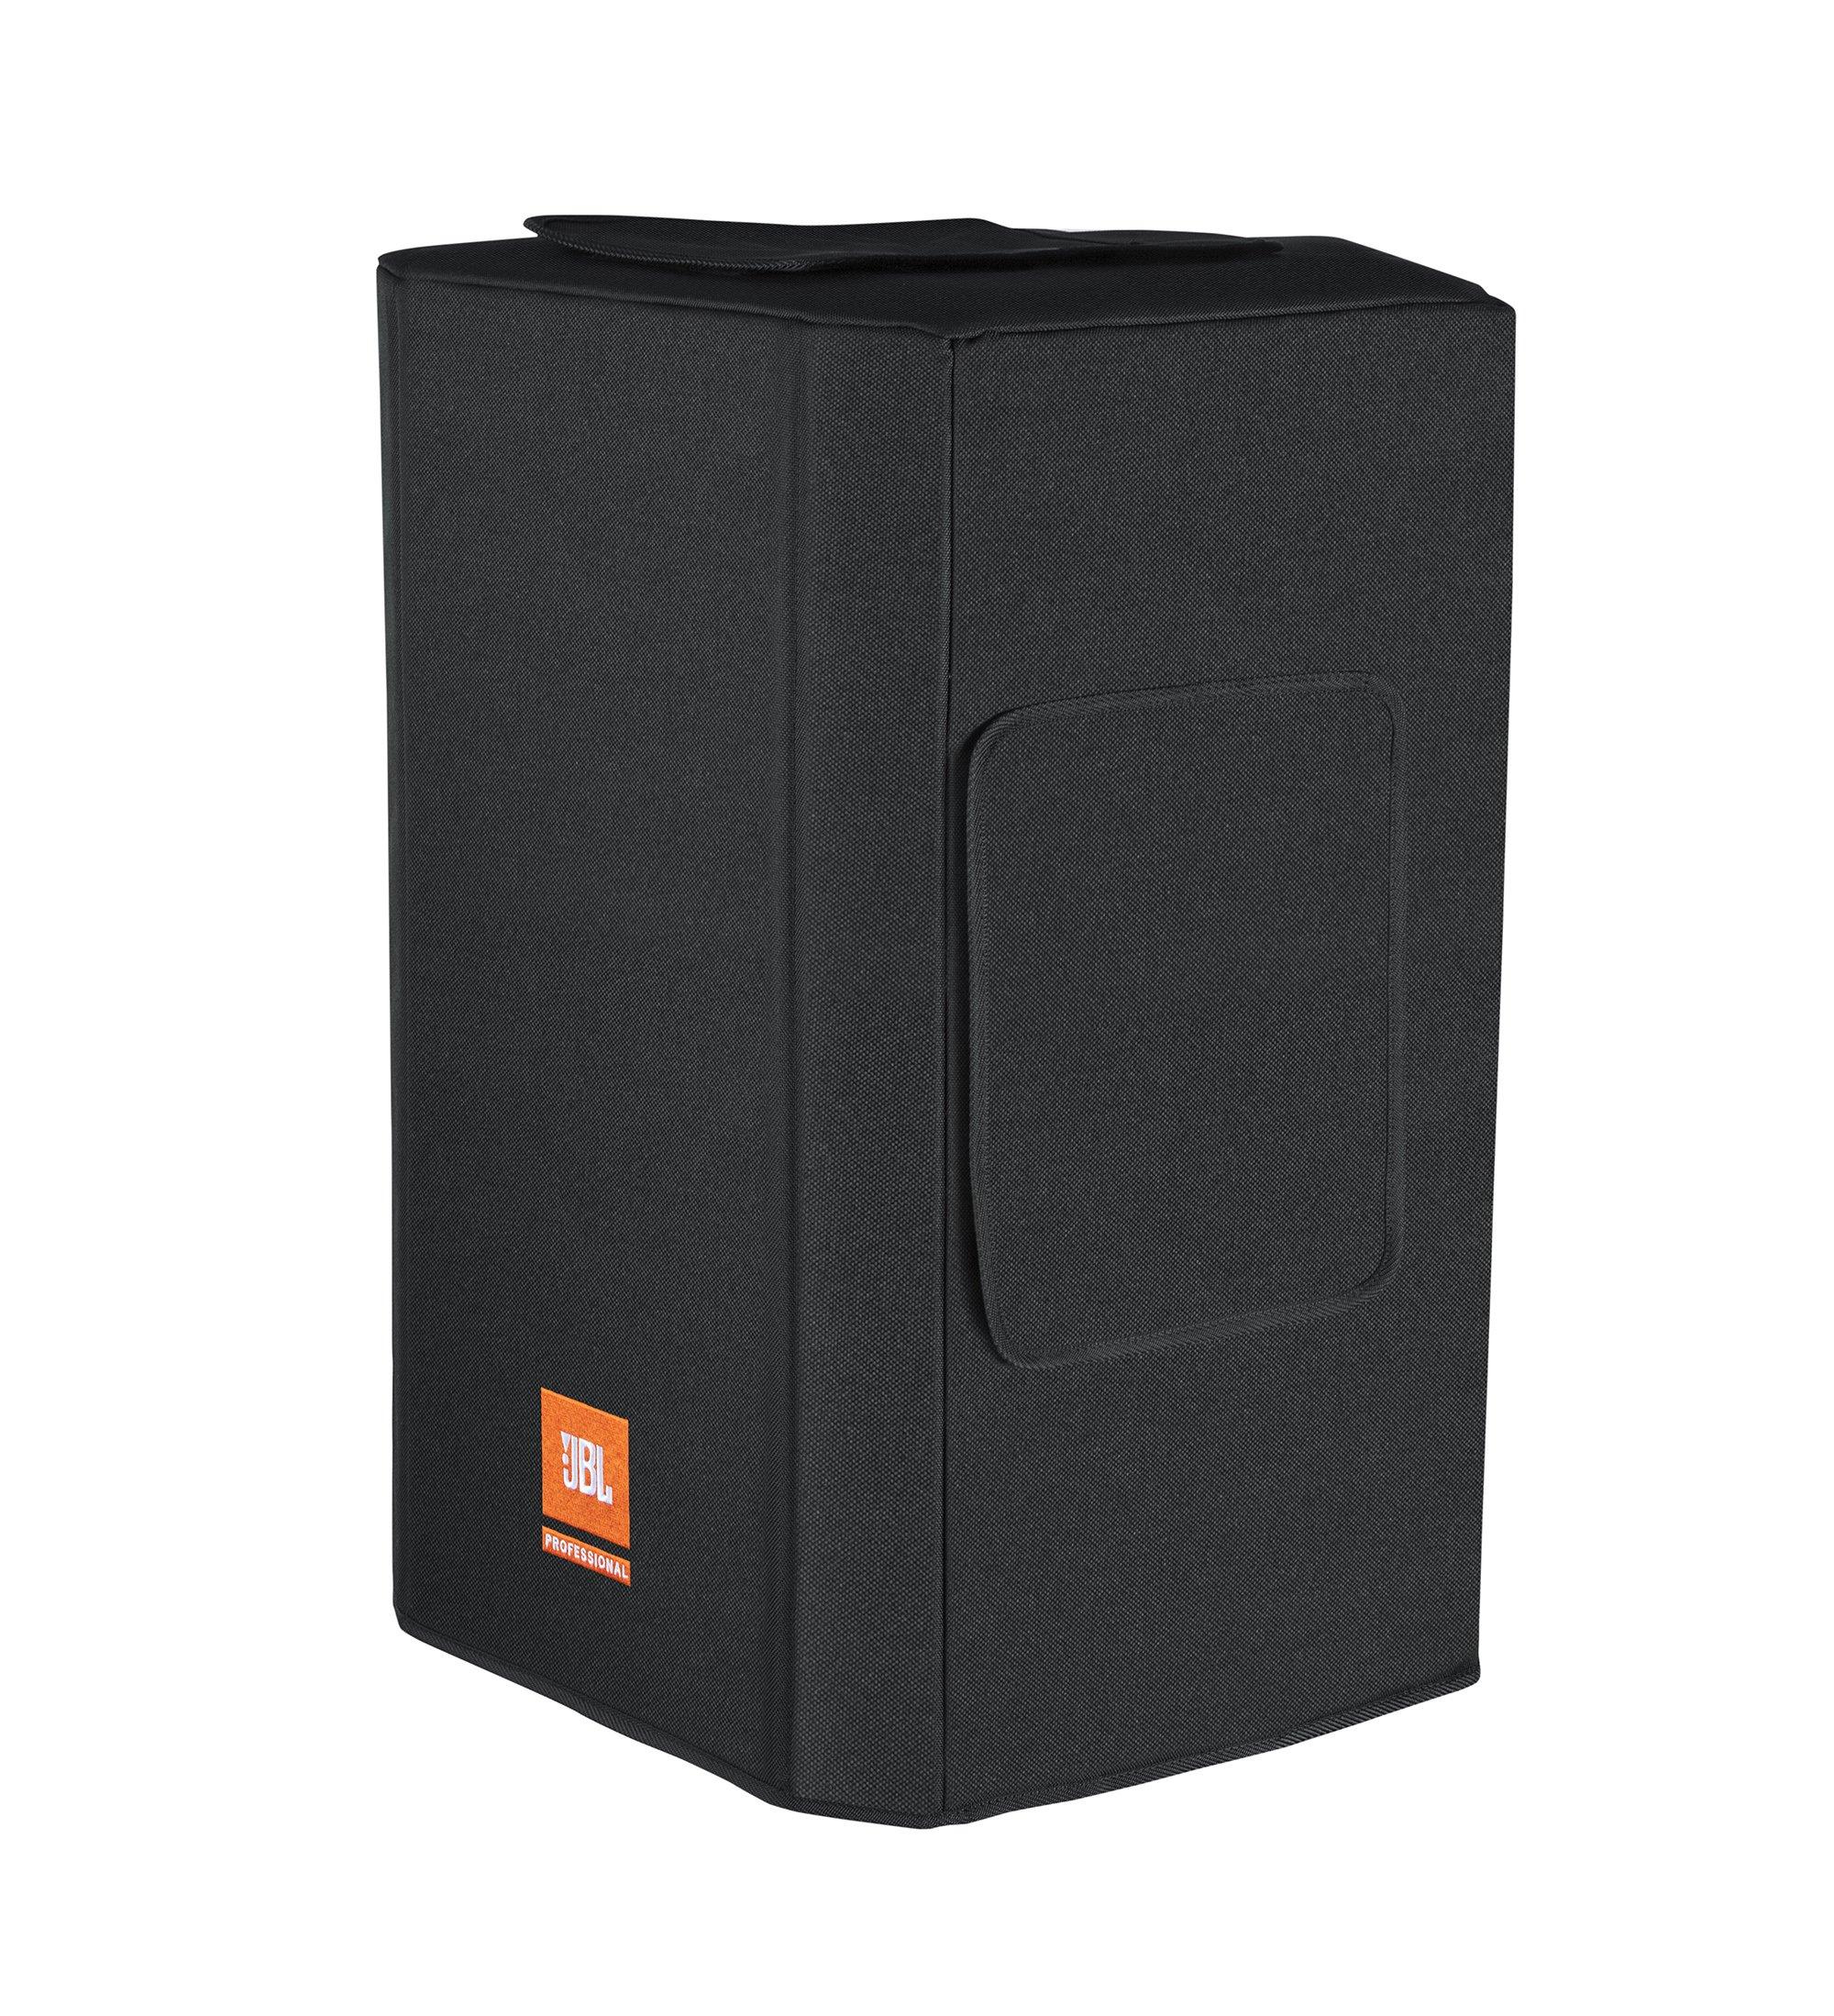 JBL Bags SRX815P-CVR-DLX Deluxe Padded Protective Cover for SRX815P-CVR